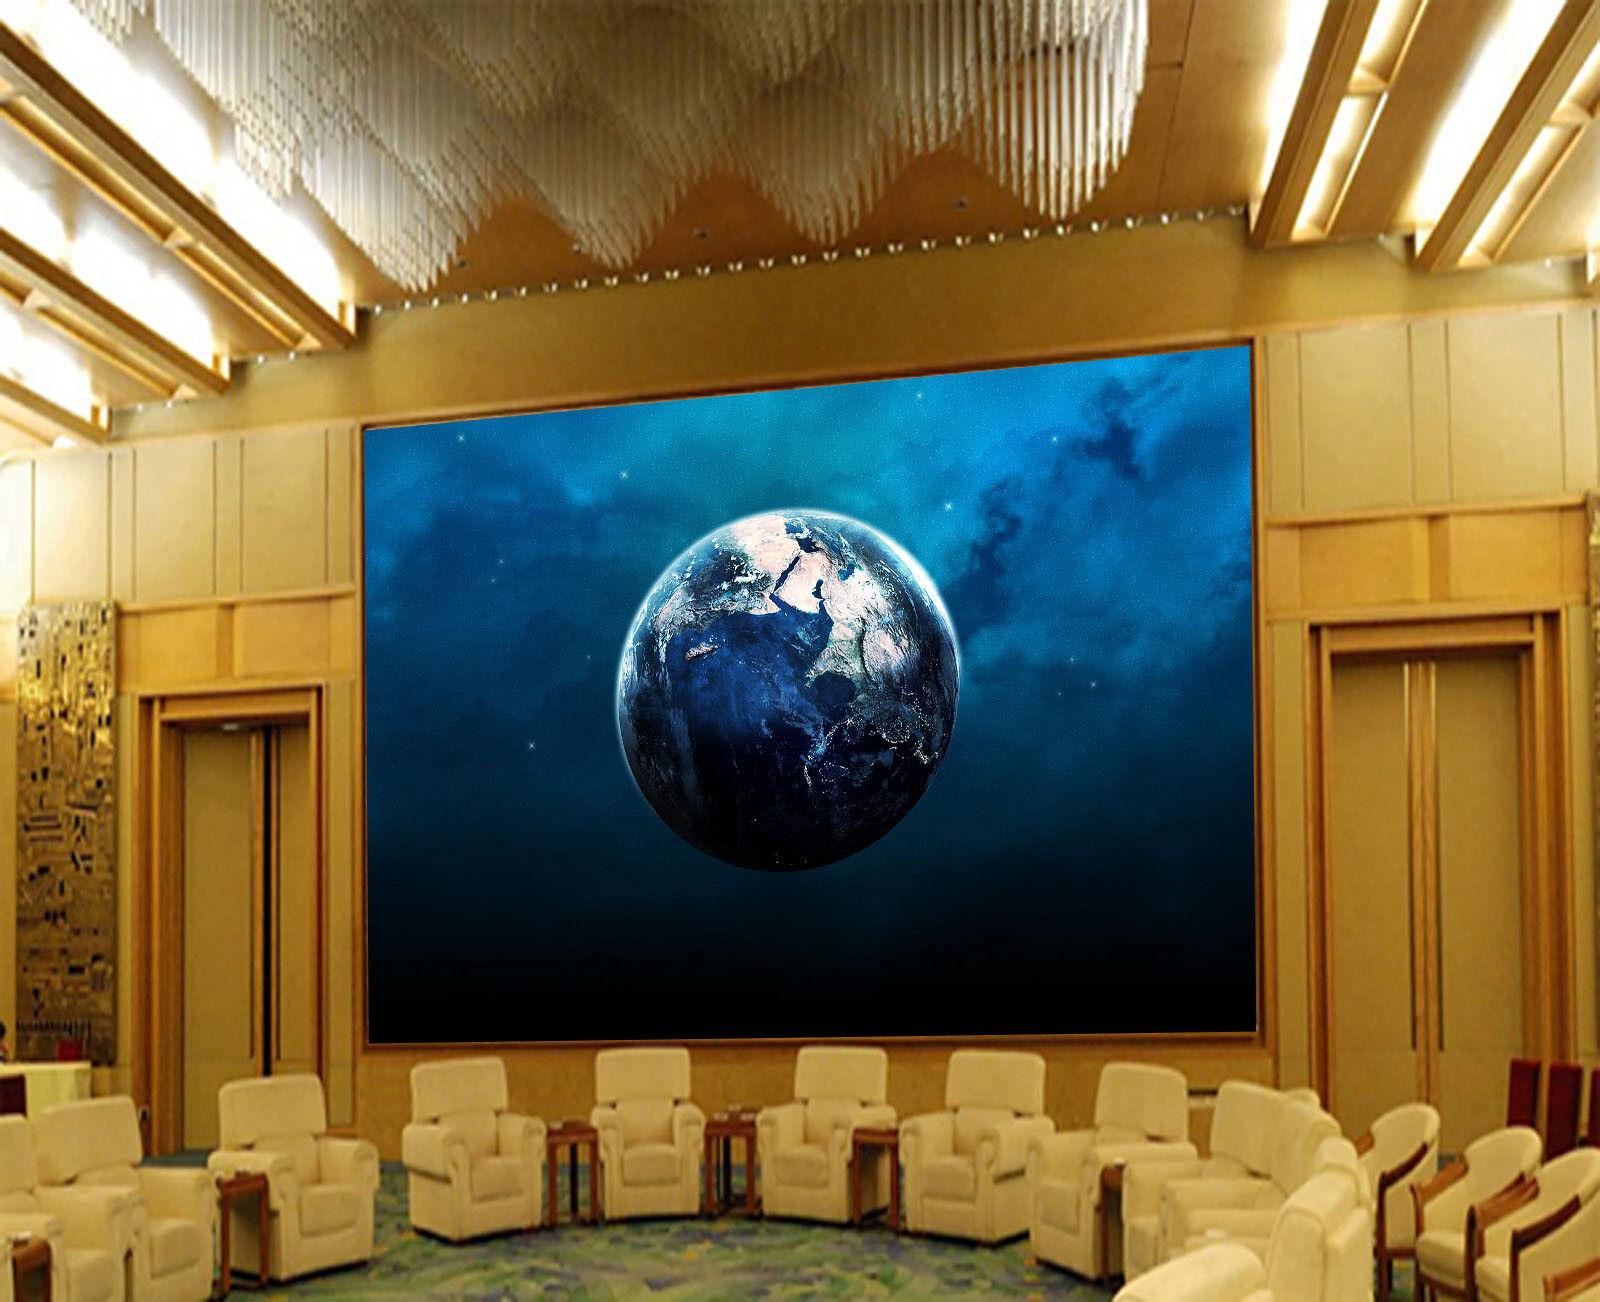 3D Bule Earth 49 Wallpaper Murals Wall Print Wallpaper Mural AJ WALL AU Summer